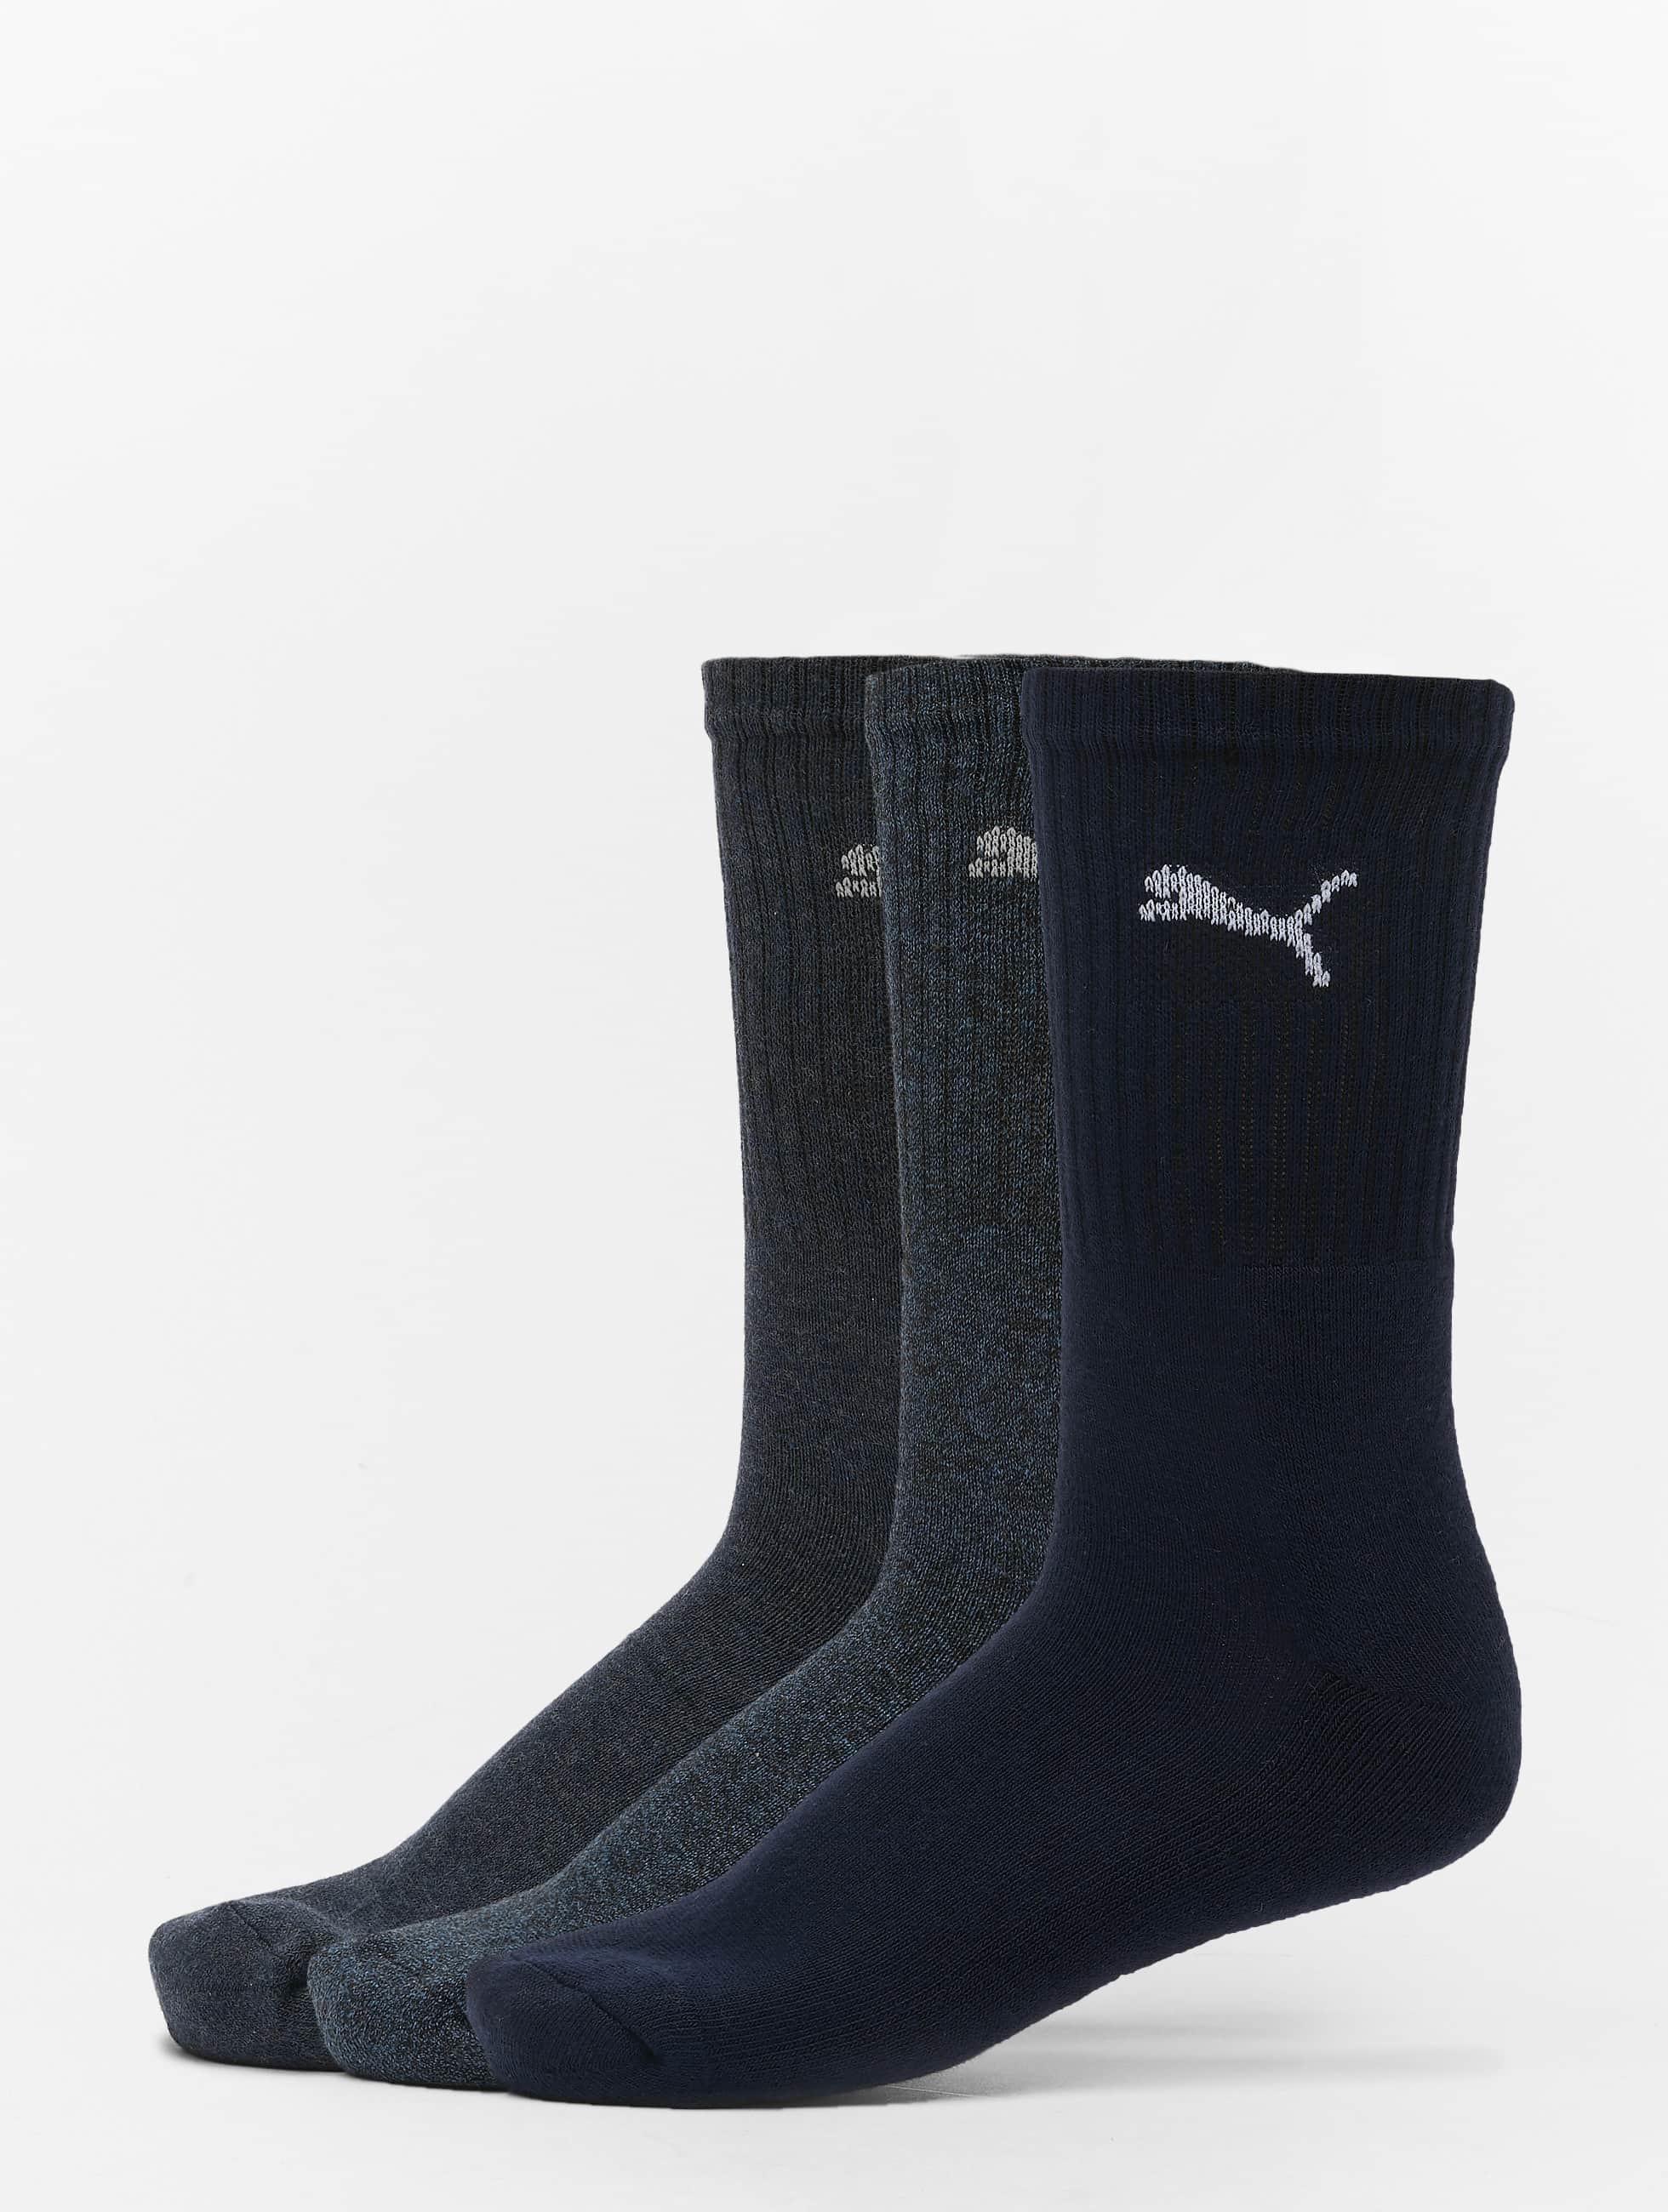 Puma Männer,Frauen Socken 3-Pack Sport in blau